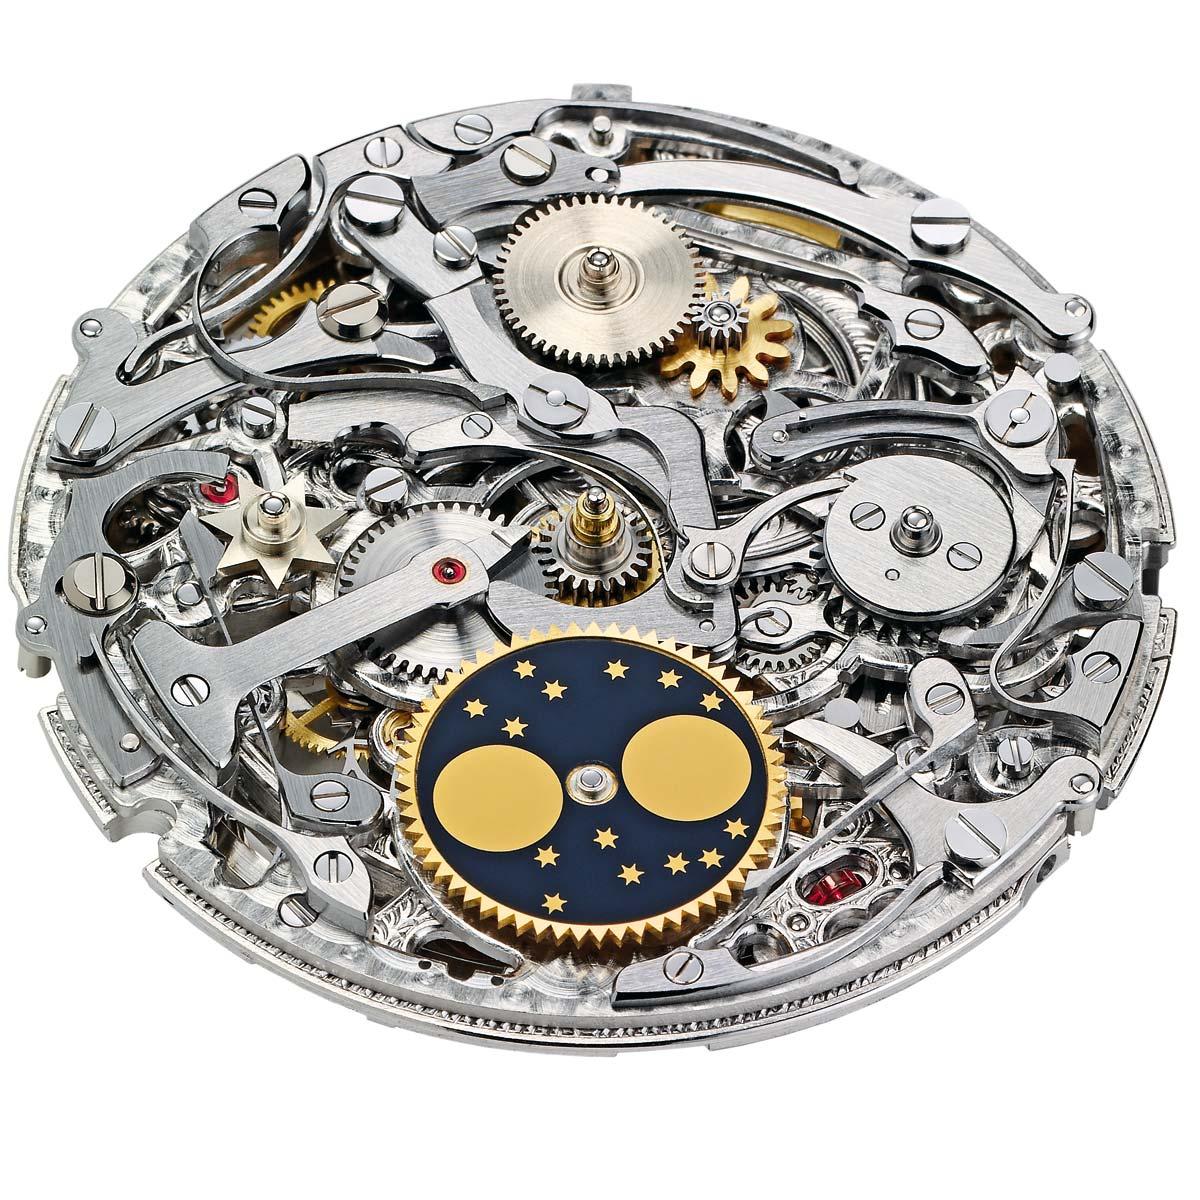 отечественные наручные часы